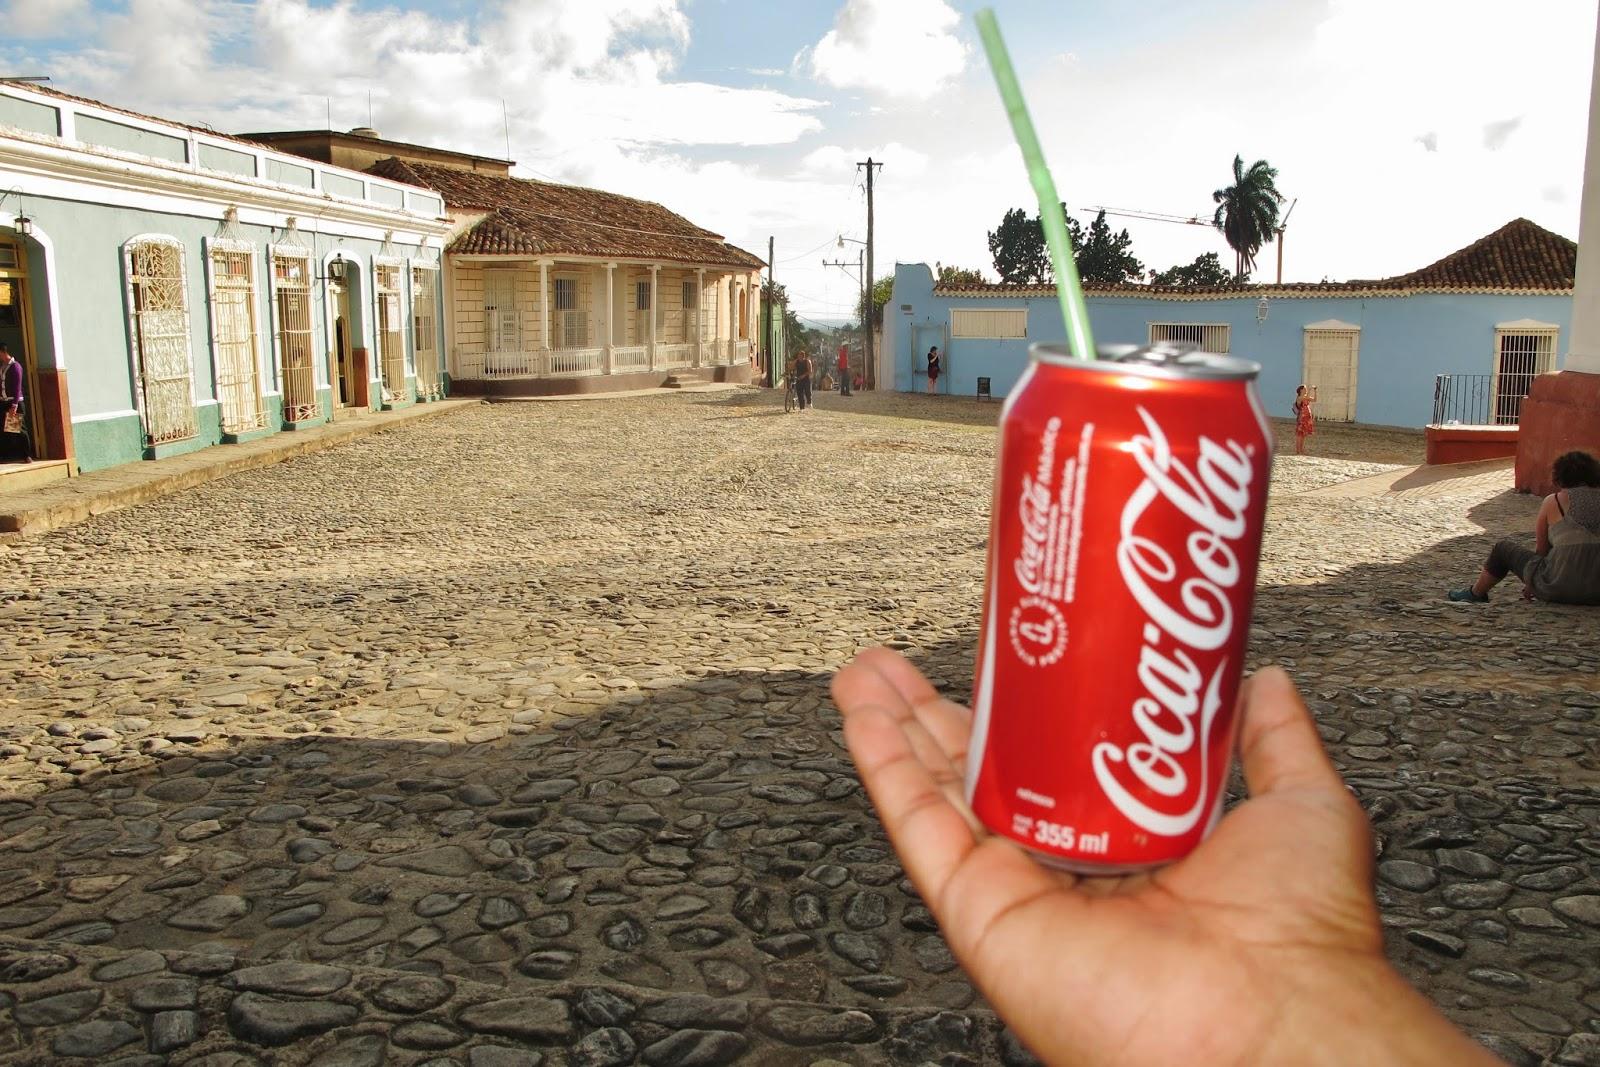 Imperialismo yanque no Centro histórico de Trinidad, em Cuba.